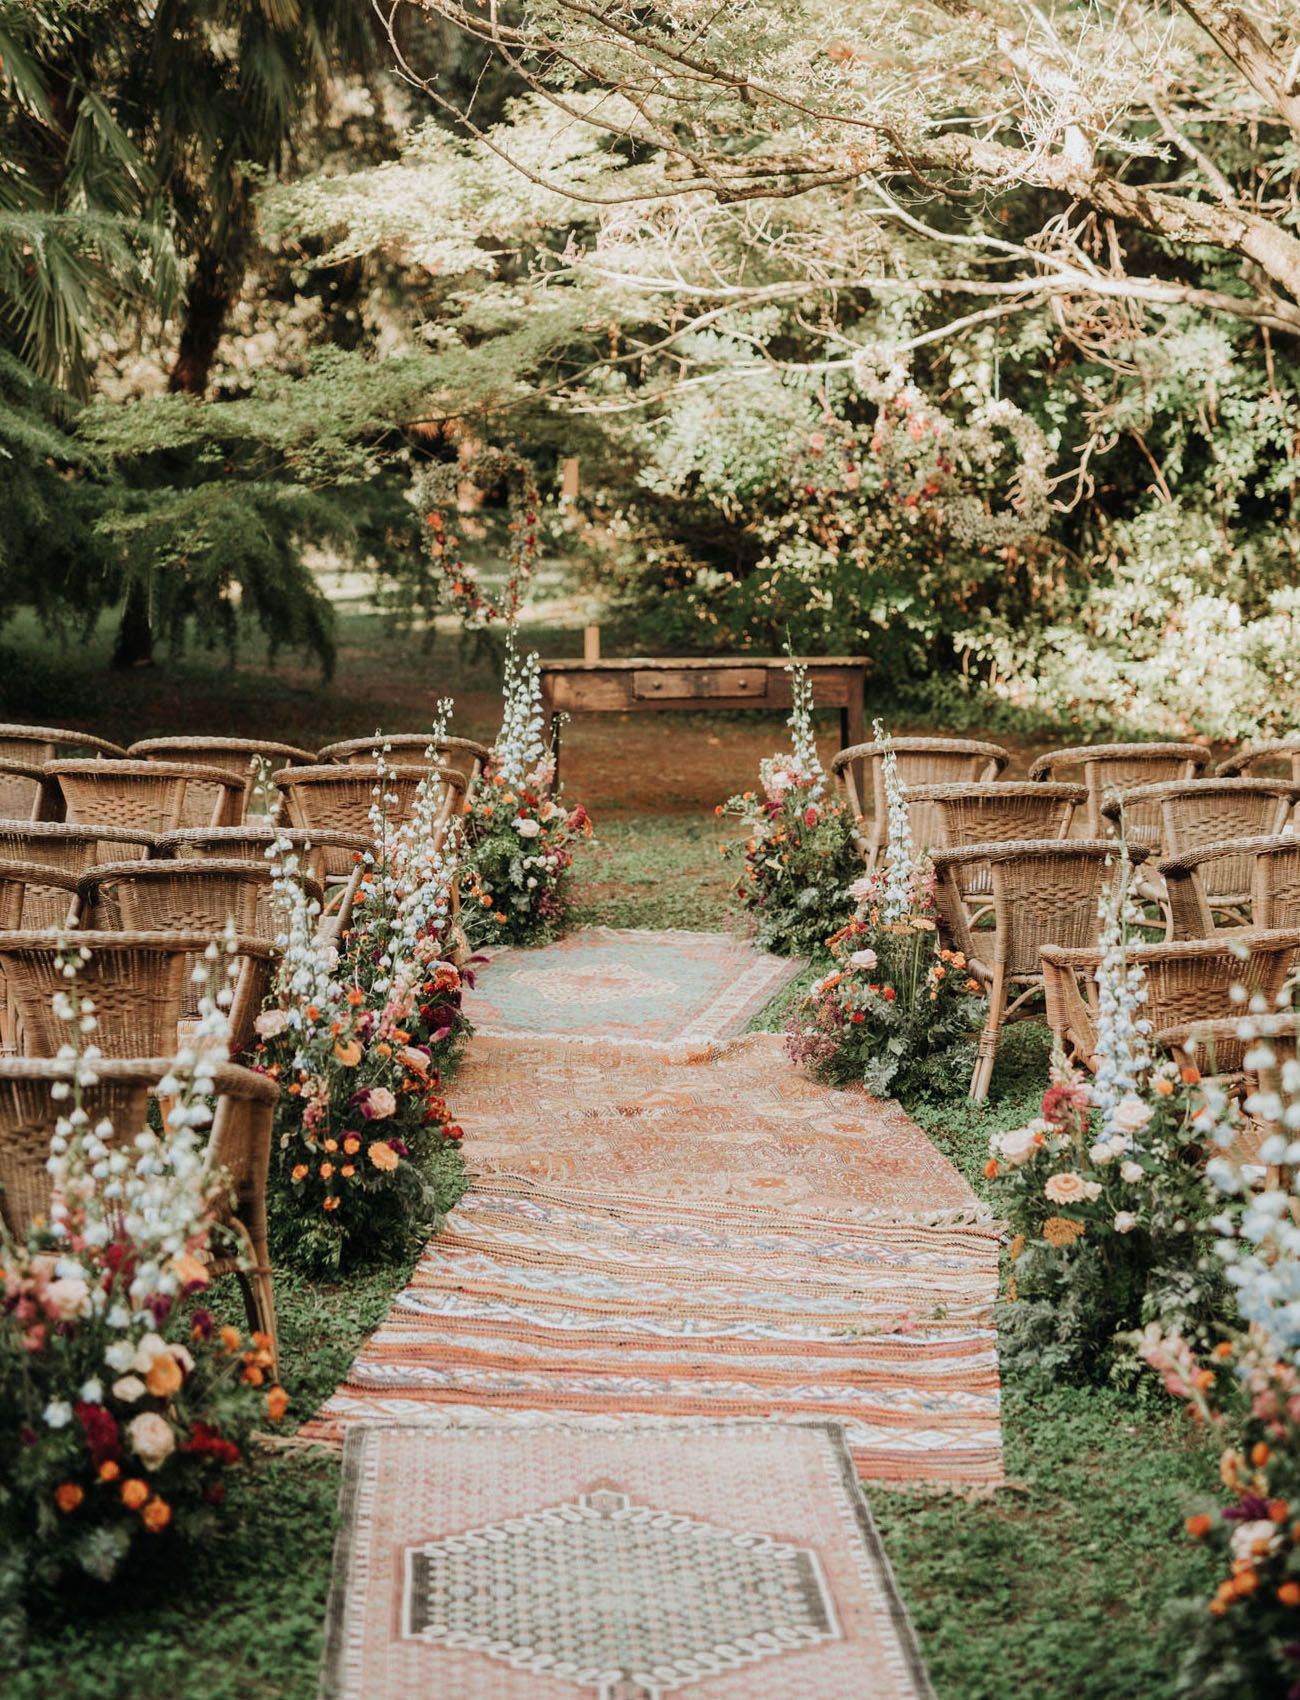 Pin On Wedding Ceremony Ideas Inspiration